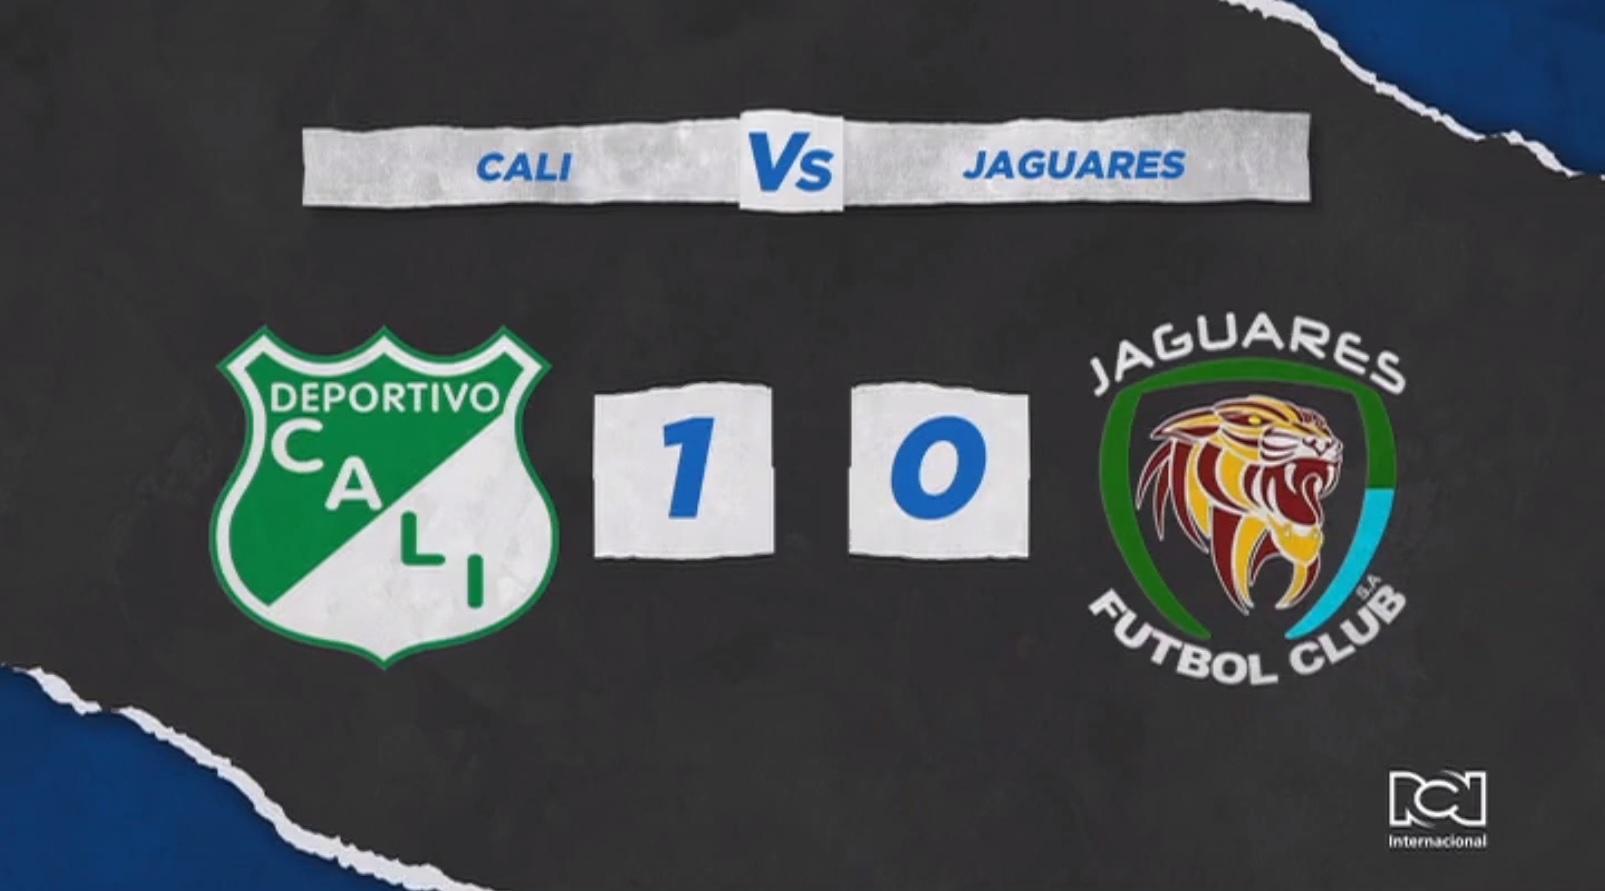 Deportivo Cali venció por la mínima diferencia a Jaguares en el arranque de la Liga BetPlay 2021